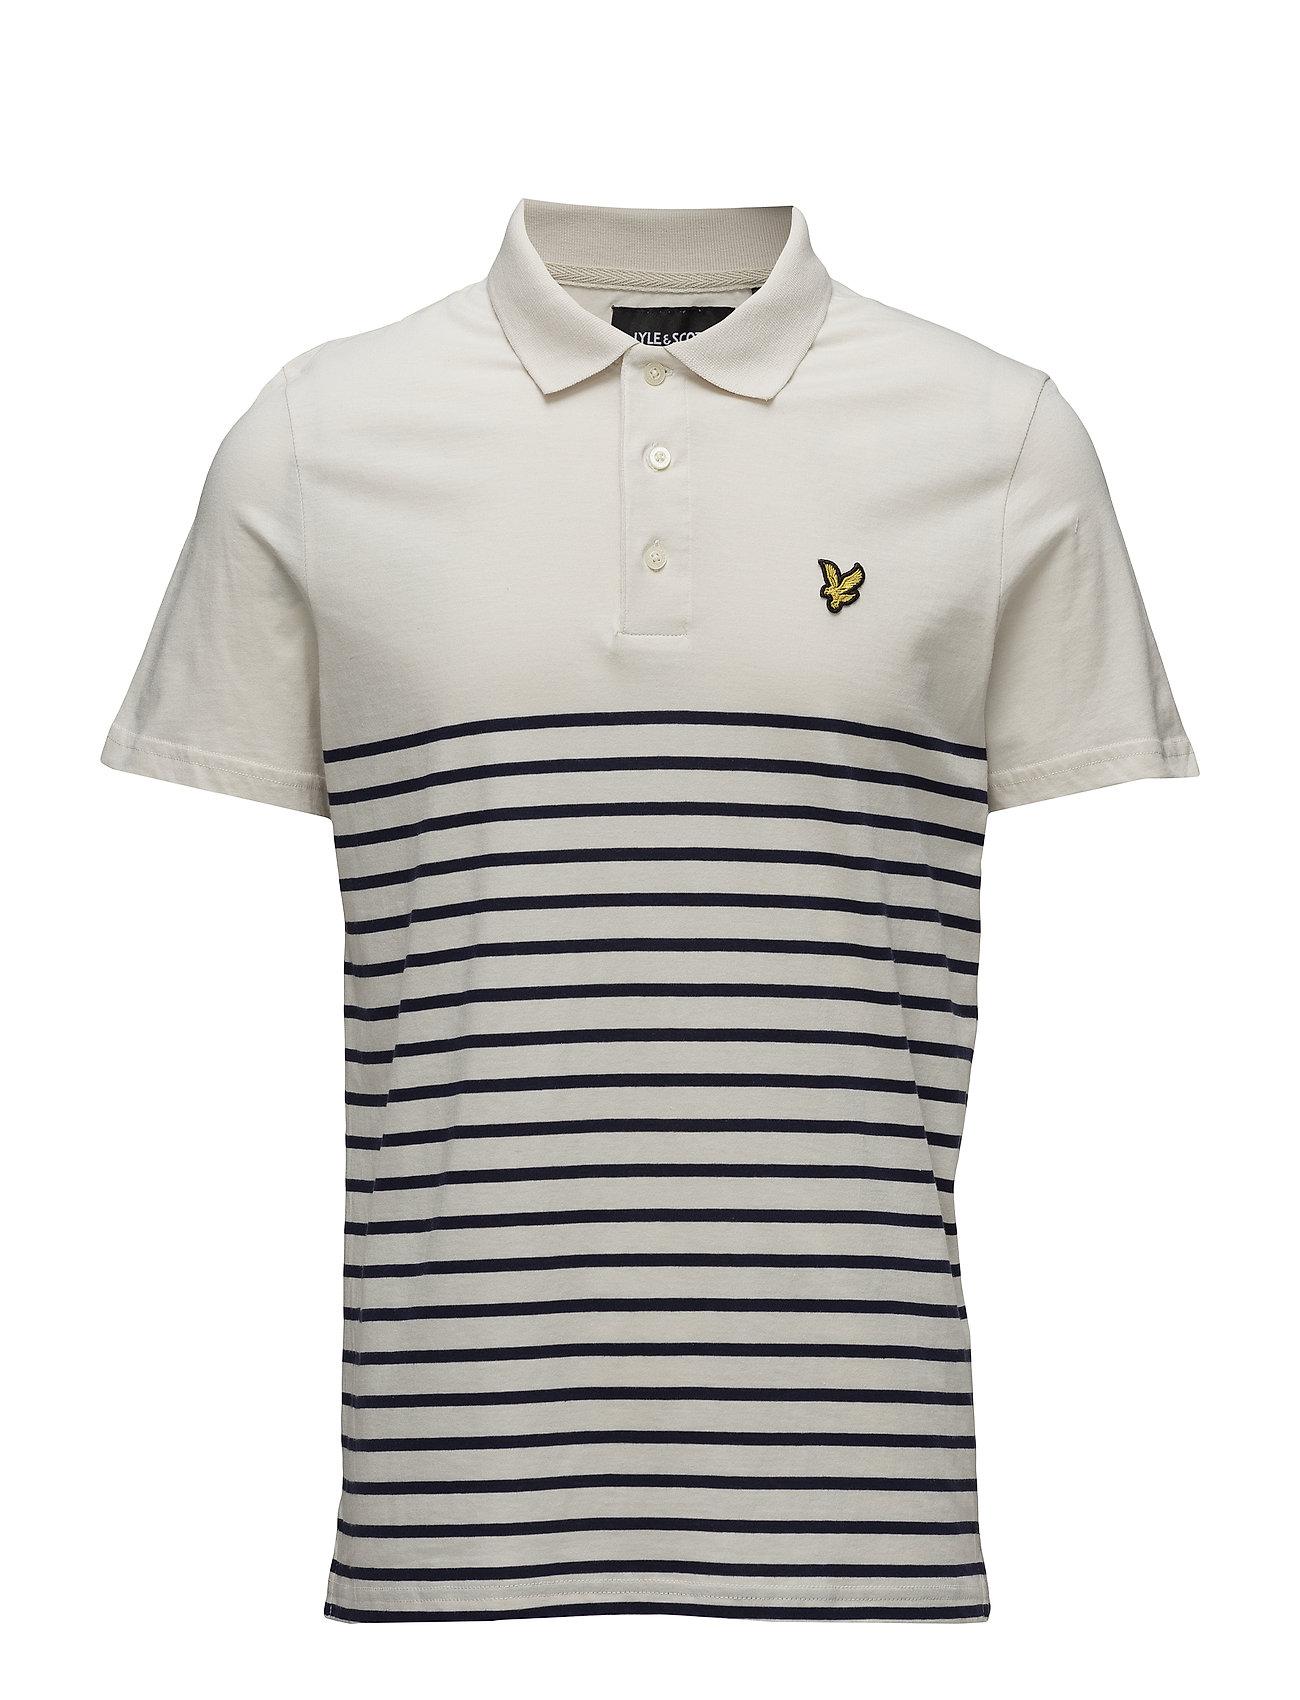 Lyle & Scott Breton Stripe Polo Shirt Ögrönlar